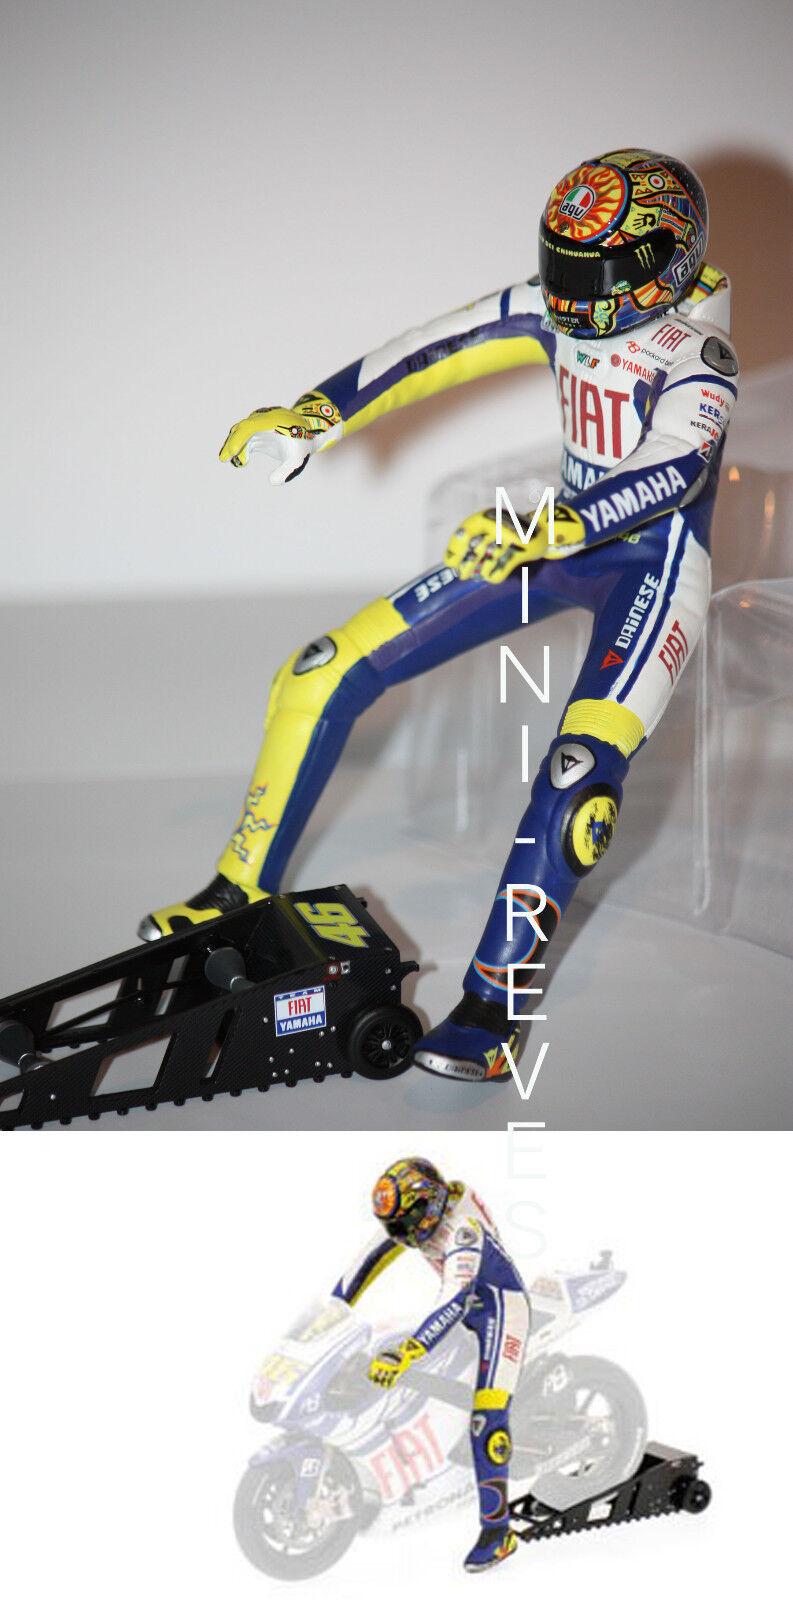 Minichamps MotoGP Figurine V. Rossi 2009 1/12 312090046